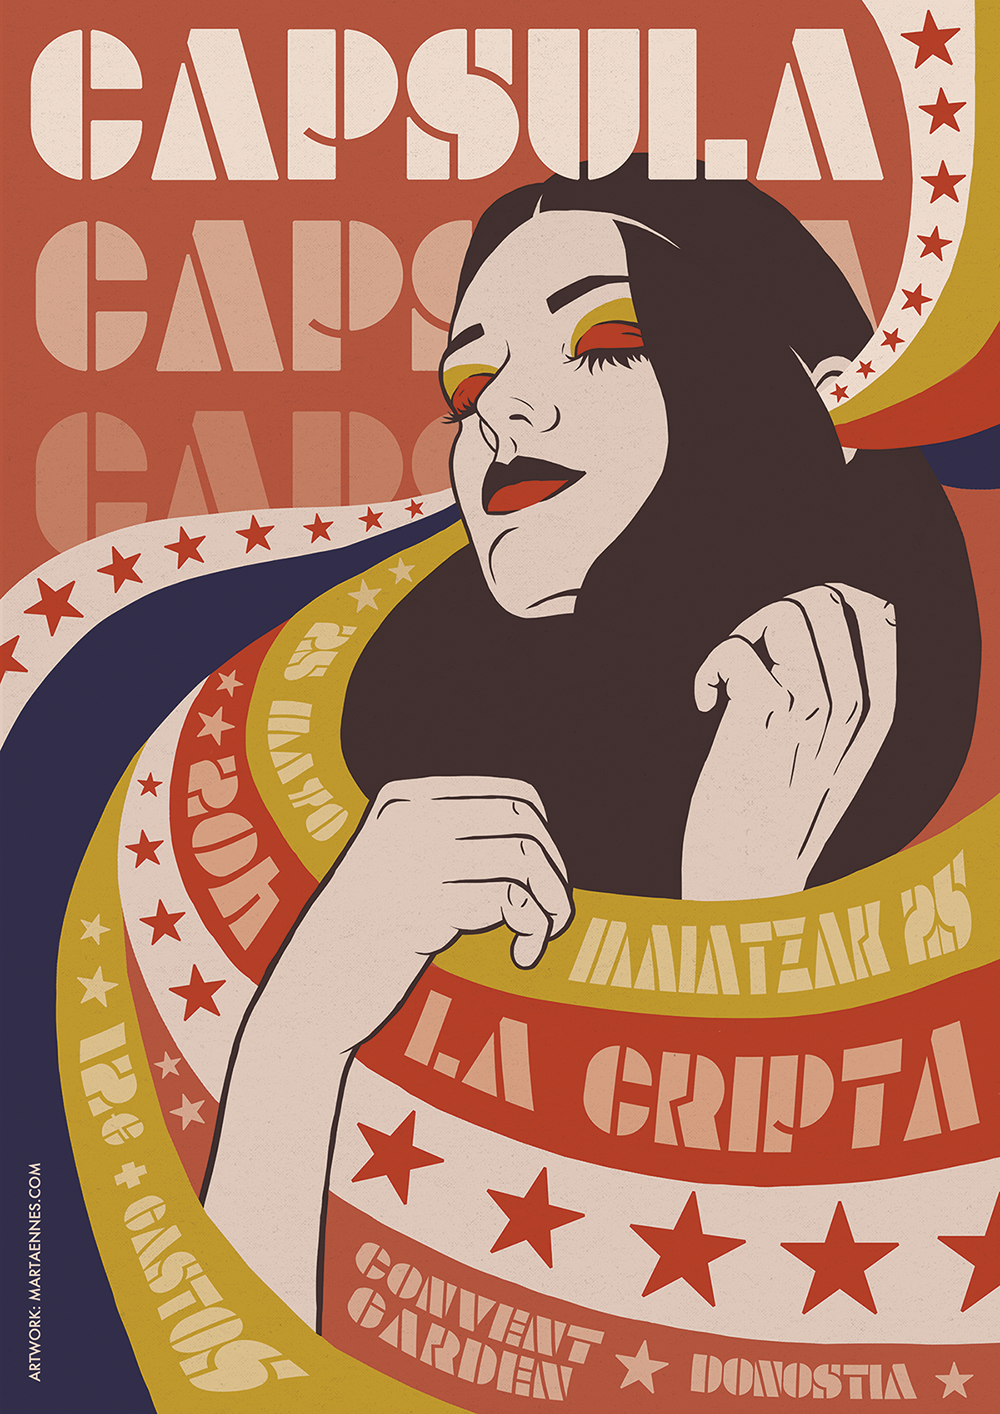 Capsula Poster Band Grupo Cápsula Tour Marta Ennes Donostia